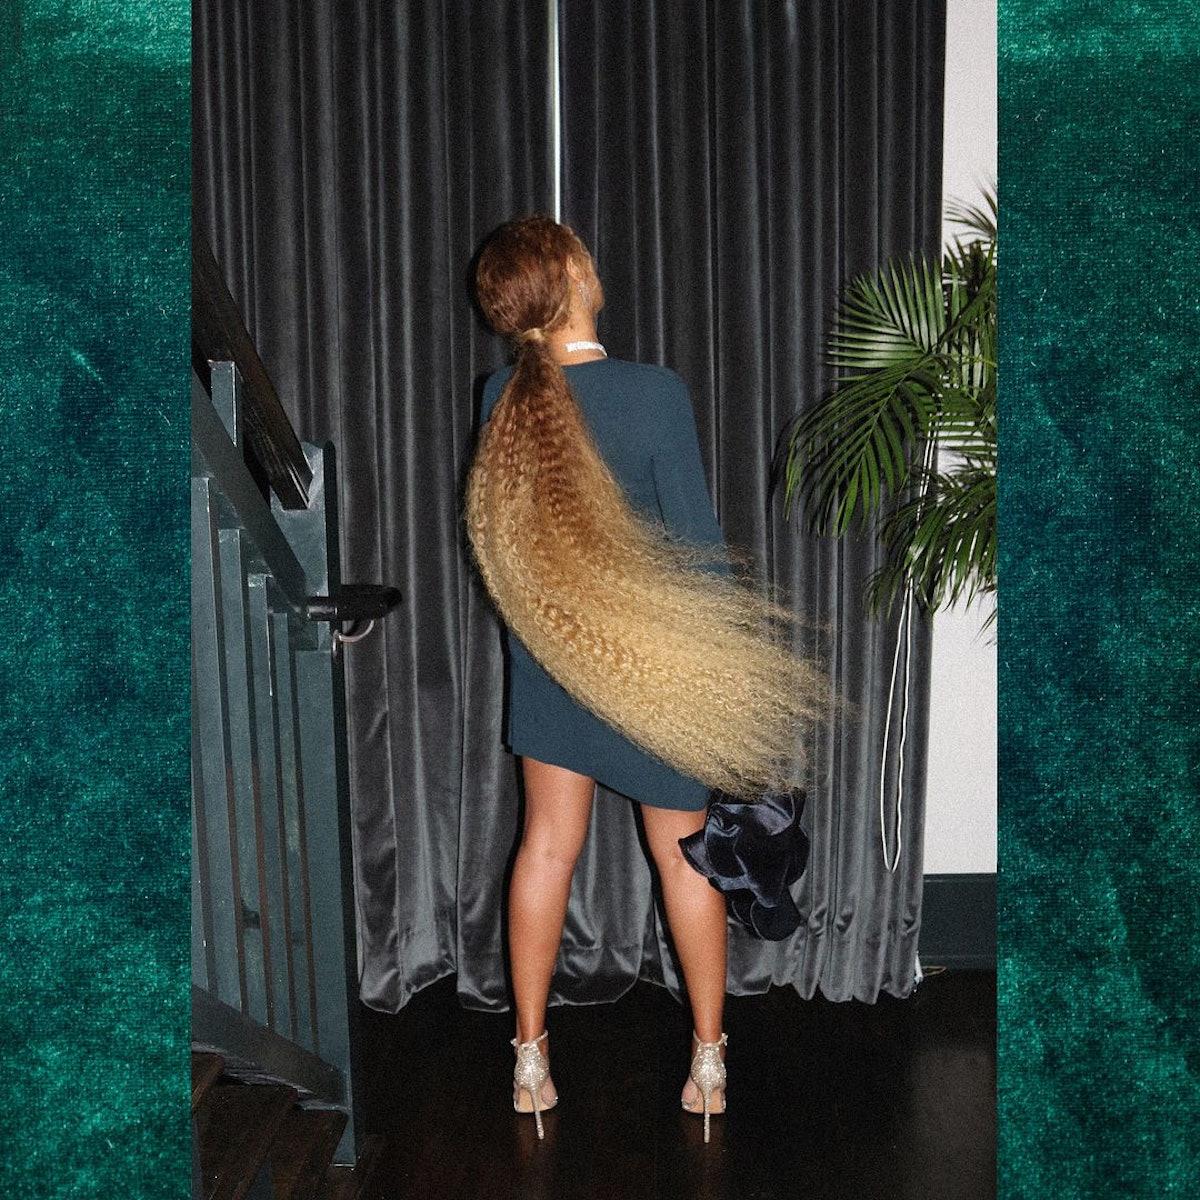 Beyoncé whipping her hair